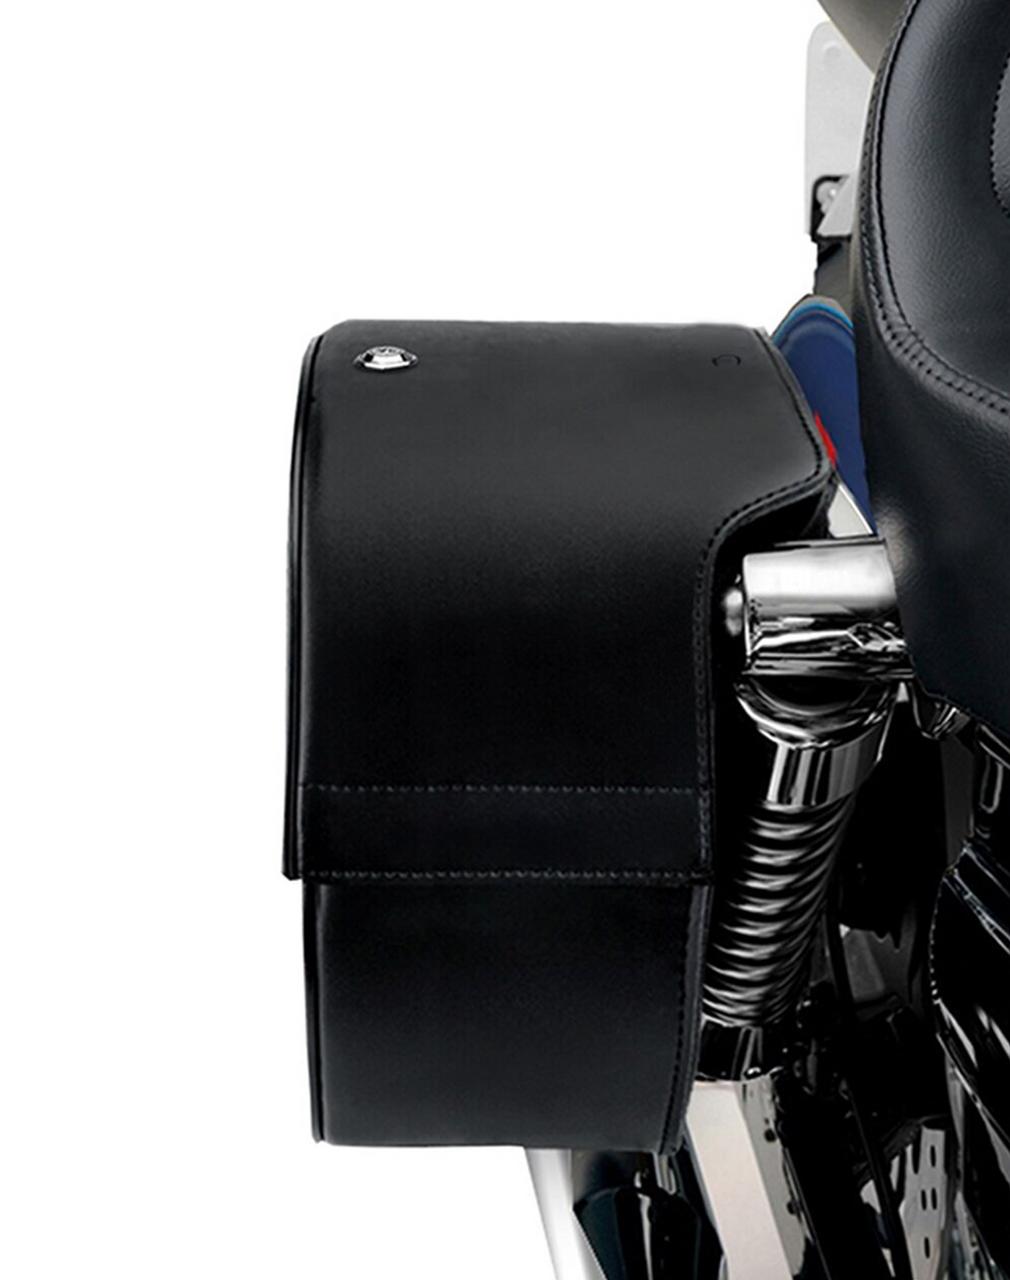 Viking Large Shock Cutout Slanted Motorcycle Saddlebags For Harley Sportster 883 Custom XL883C Shock Cutout View